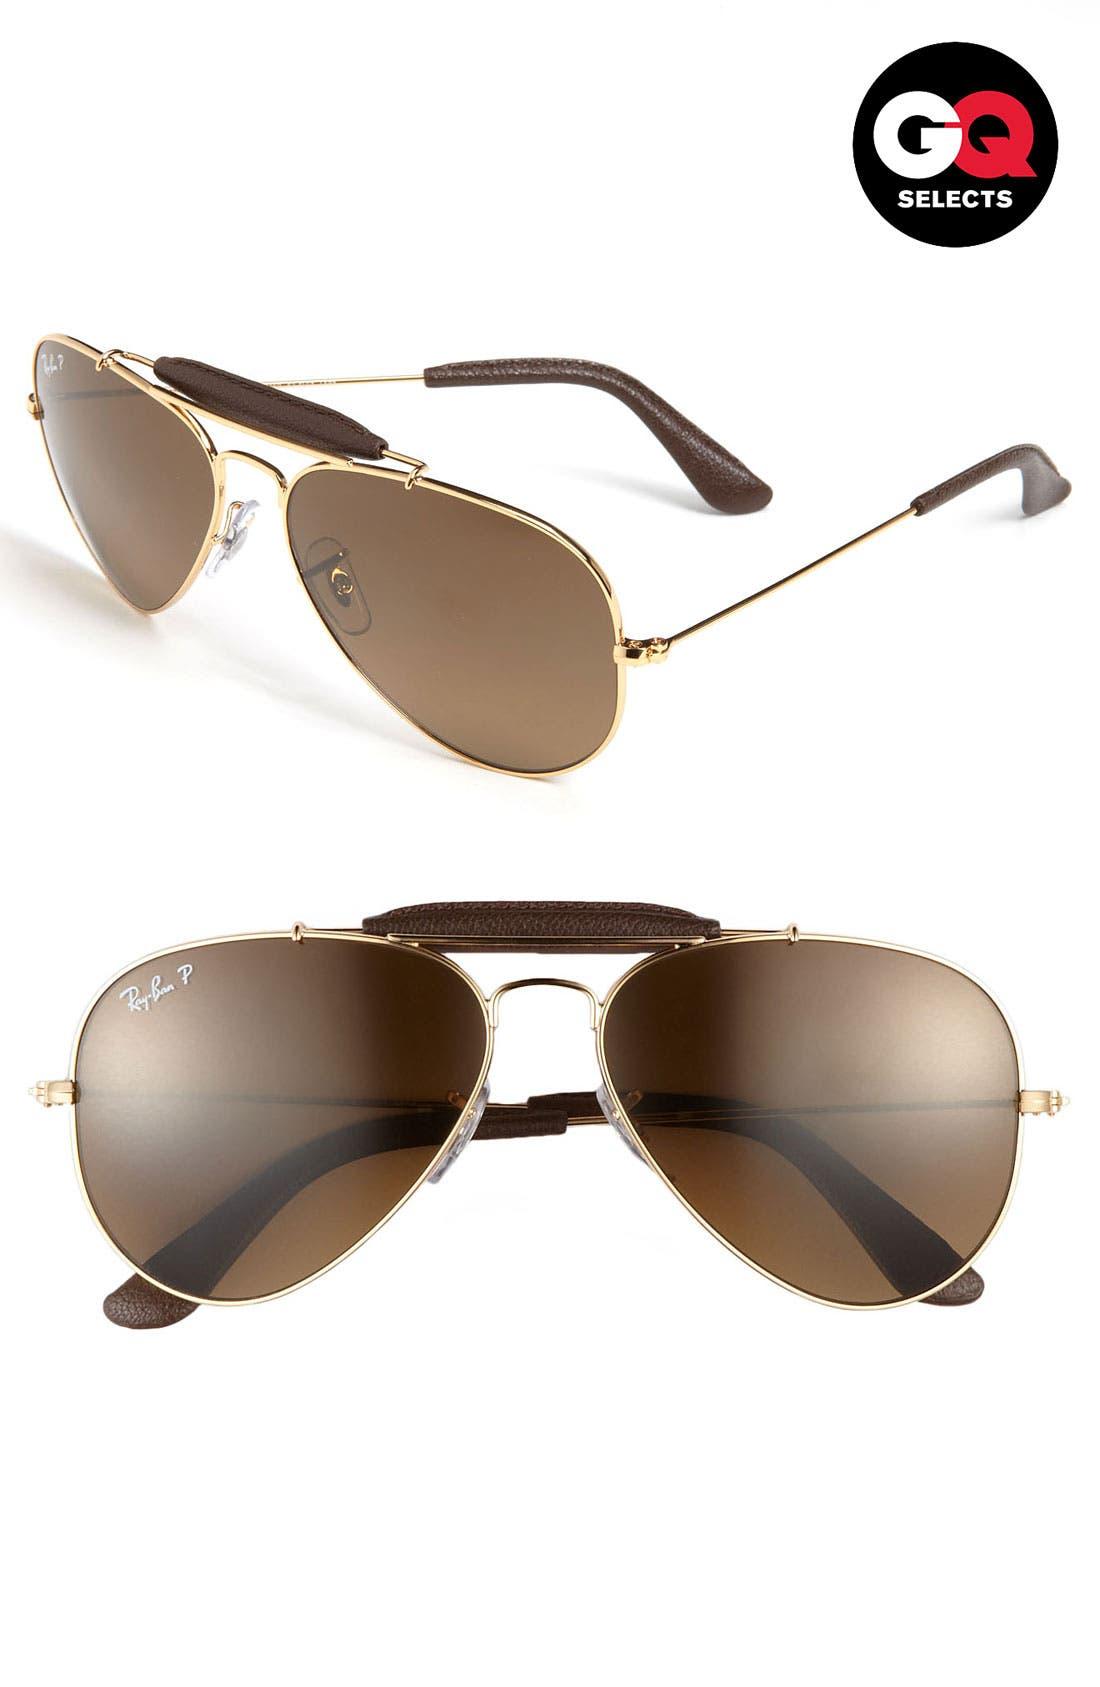 Alternate Image 1 Selected - Ray-Ban 'Outdoorsman®' 58mm Polarized Aviator Sunglasses